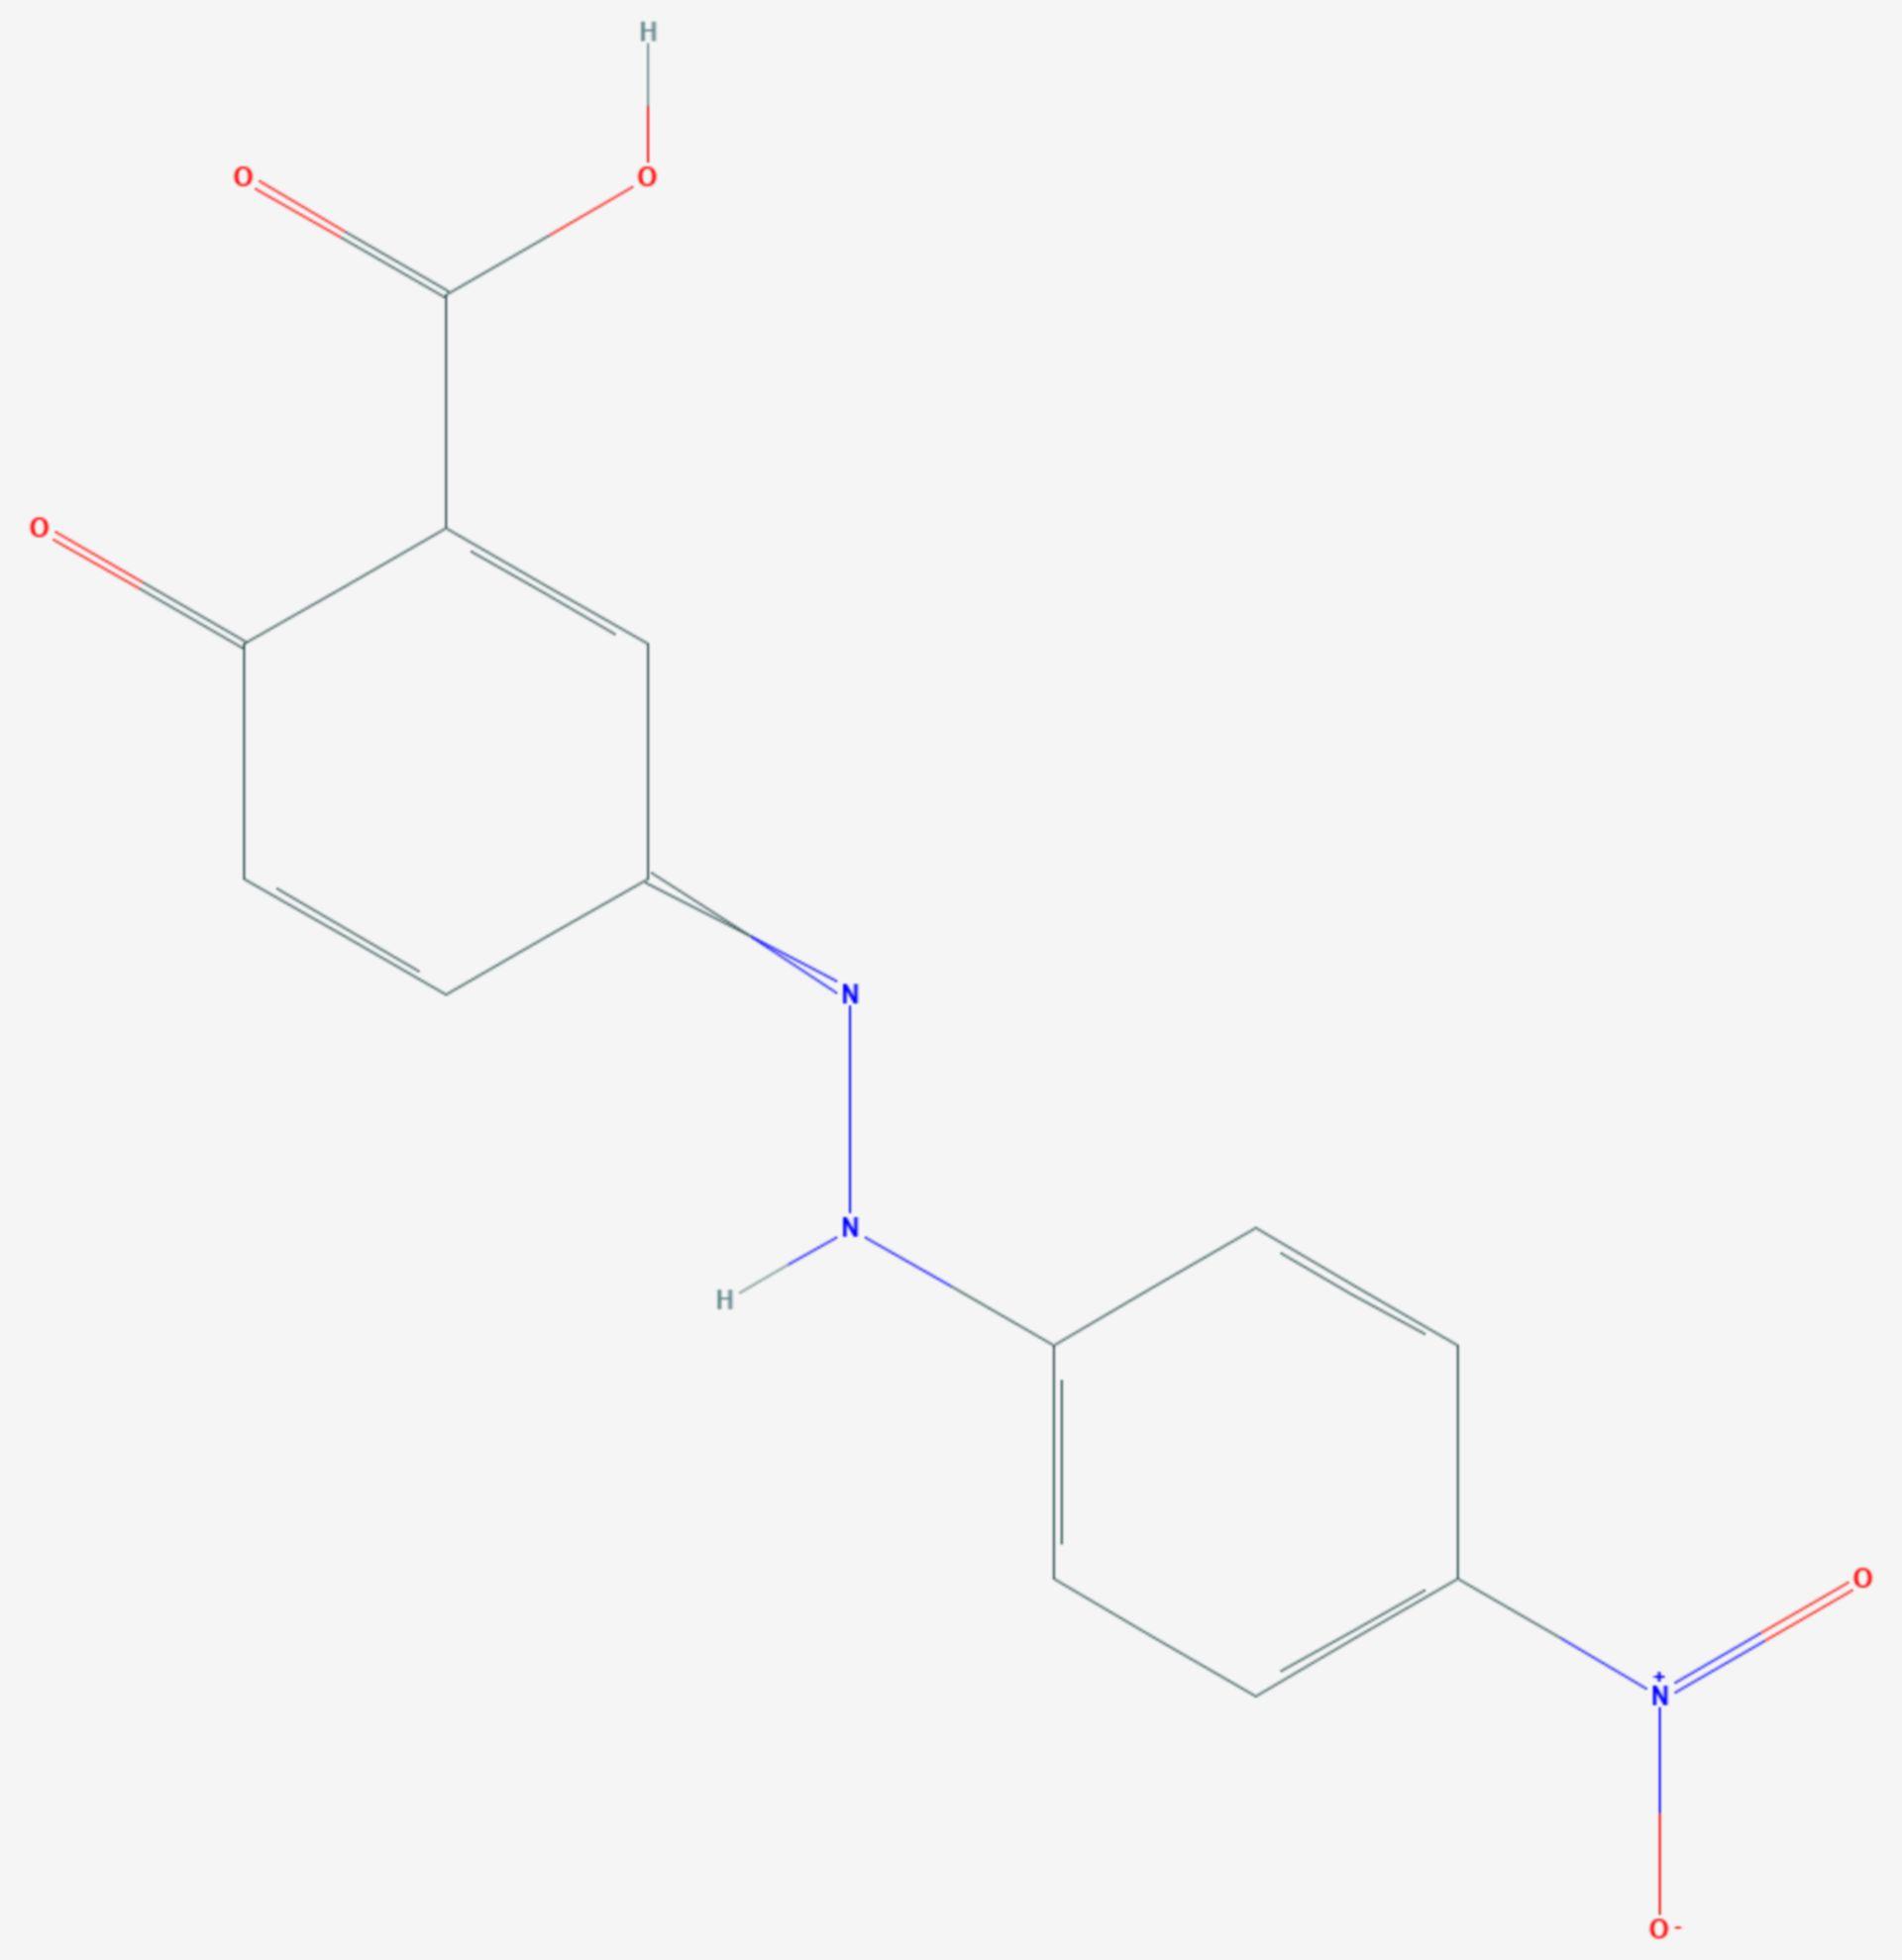 Alizaringelb R (Strukturformel)